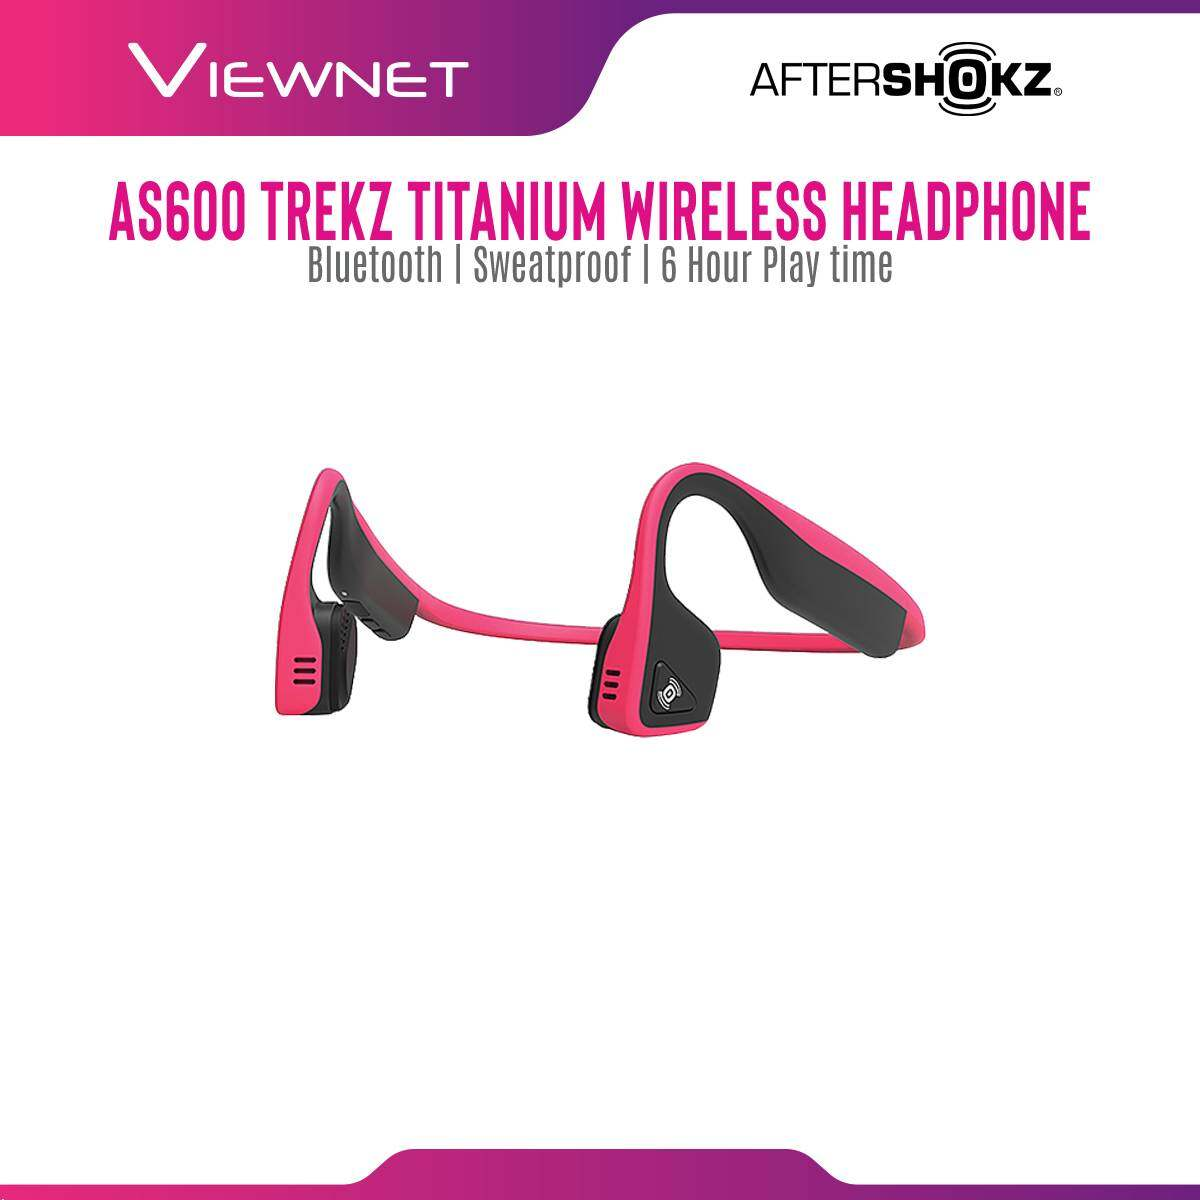 AfterShokz Trekz Titanium Mini Slate Grey/Pink Wireless Bone Conduction Headphones